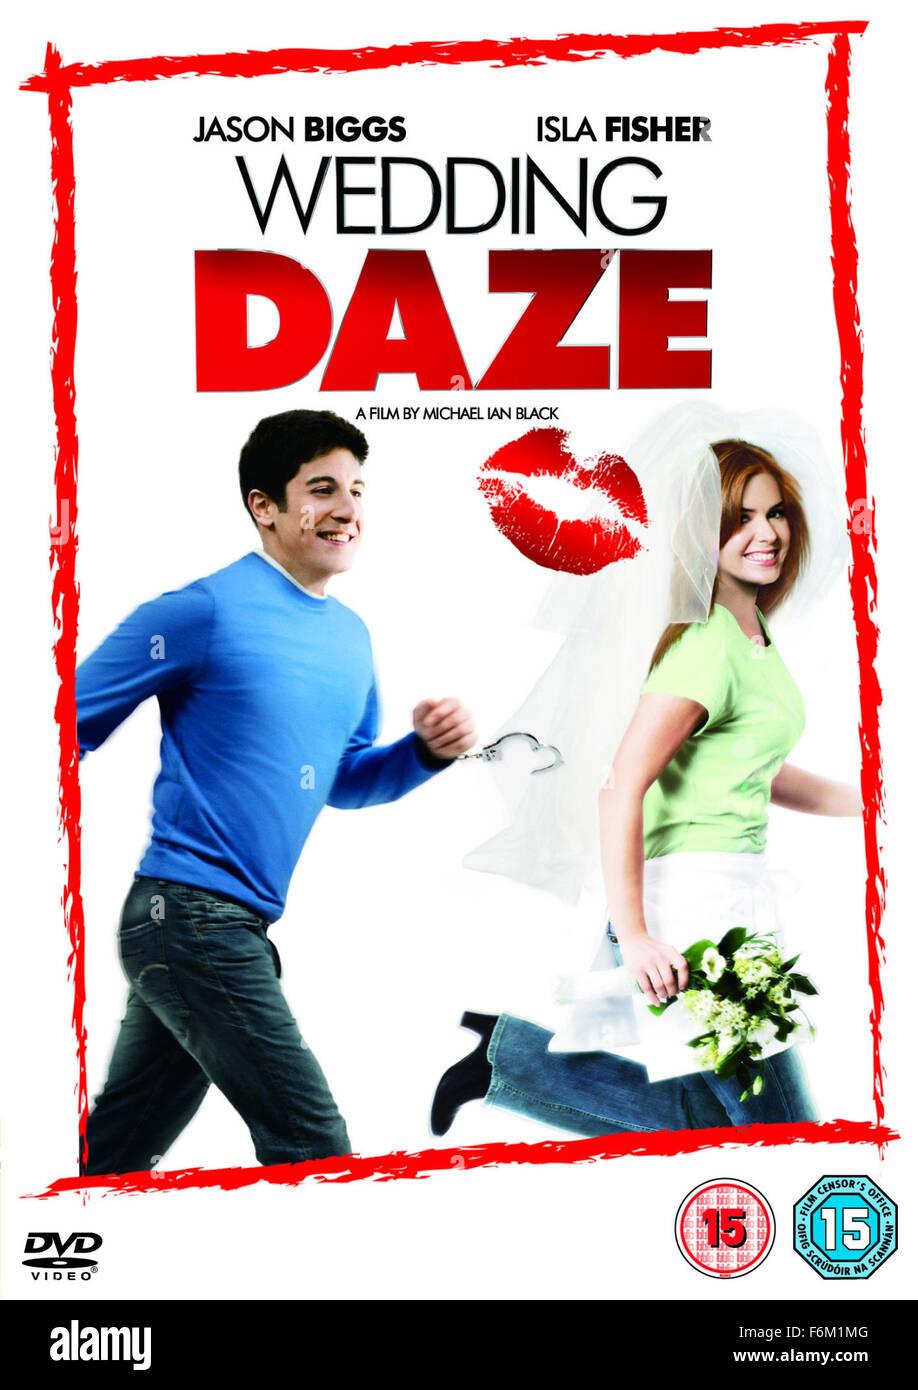 Wedding daze full movie